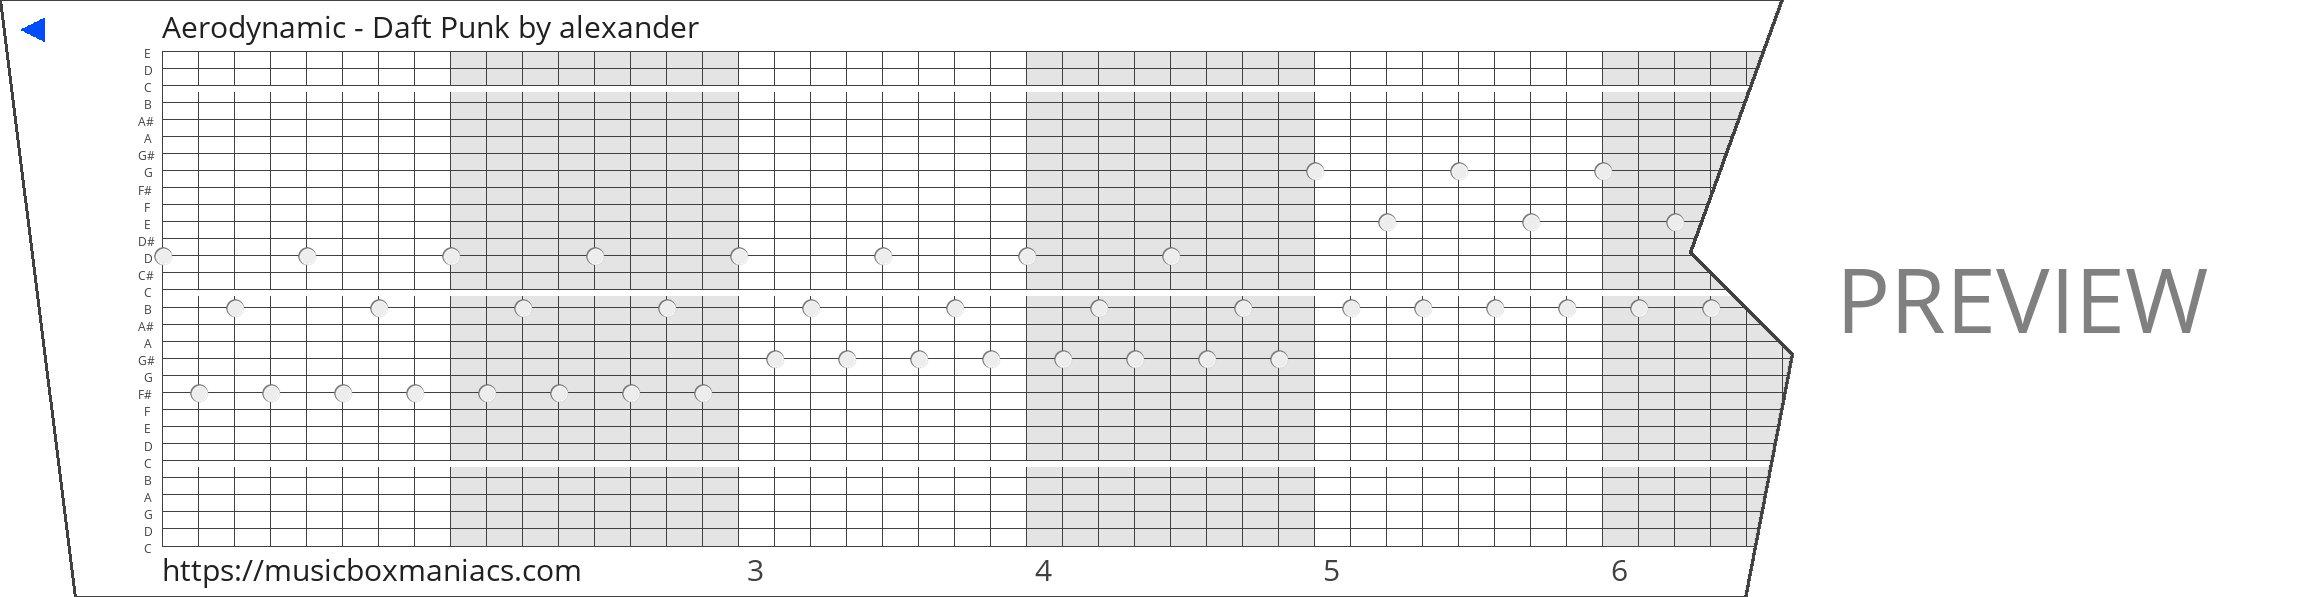 Aerodynamic - Daft Punk 30 note music box paper strip